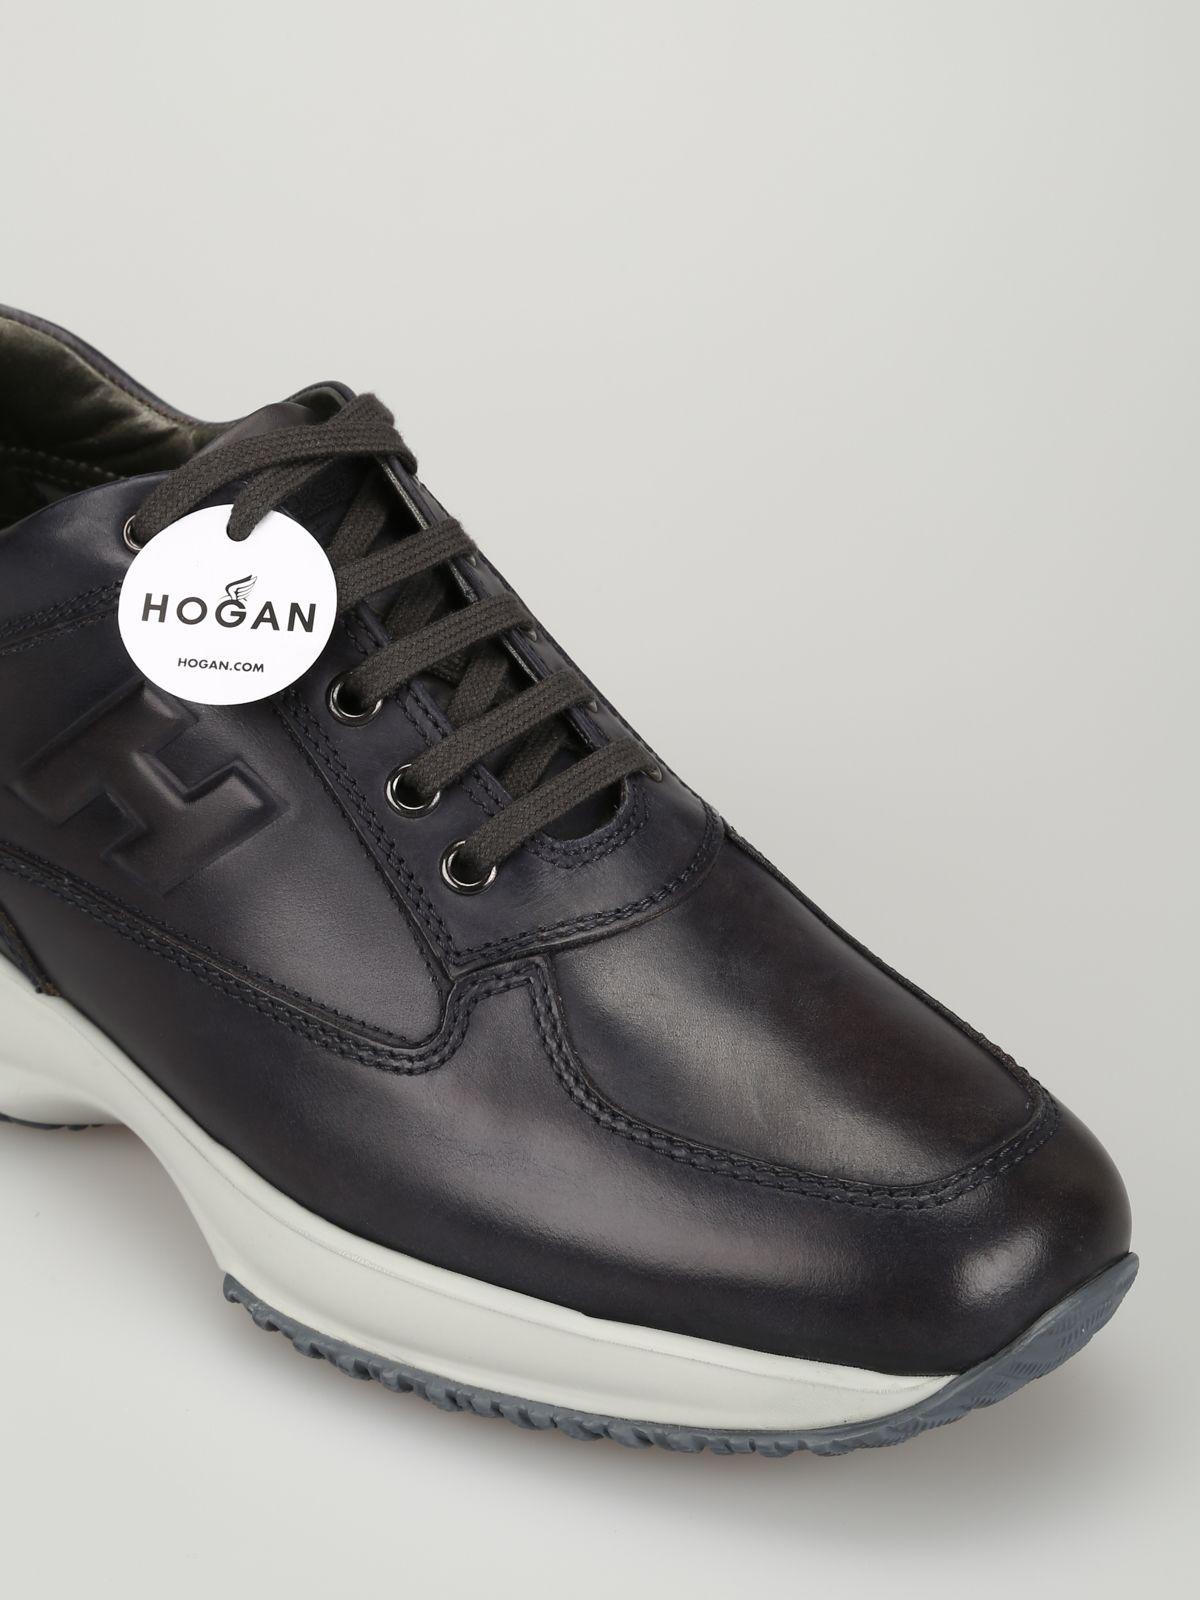 7fc530cb97 ... Hogan Slate Black Leather Interactive Sneakers Hxm00n09041kbob804 -  Ardesia ...